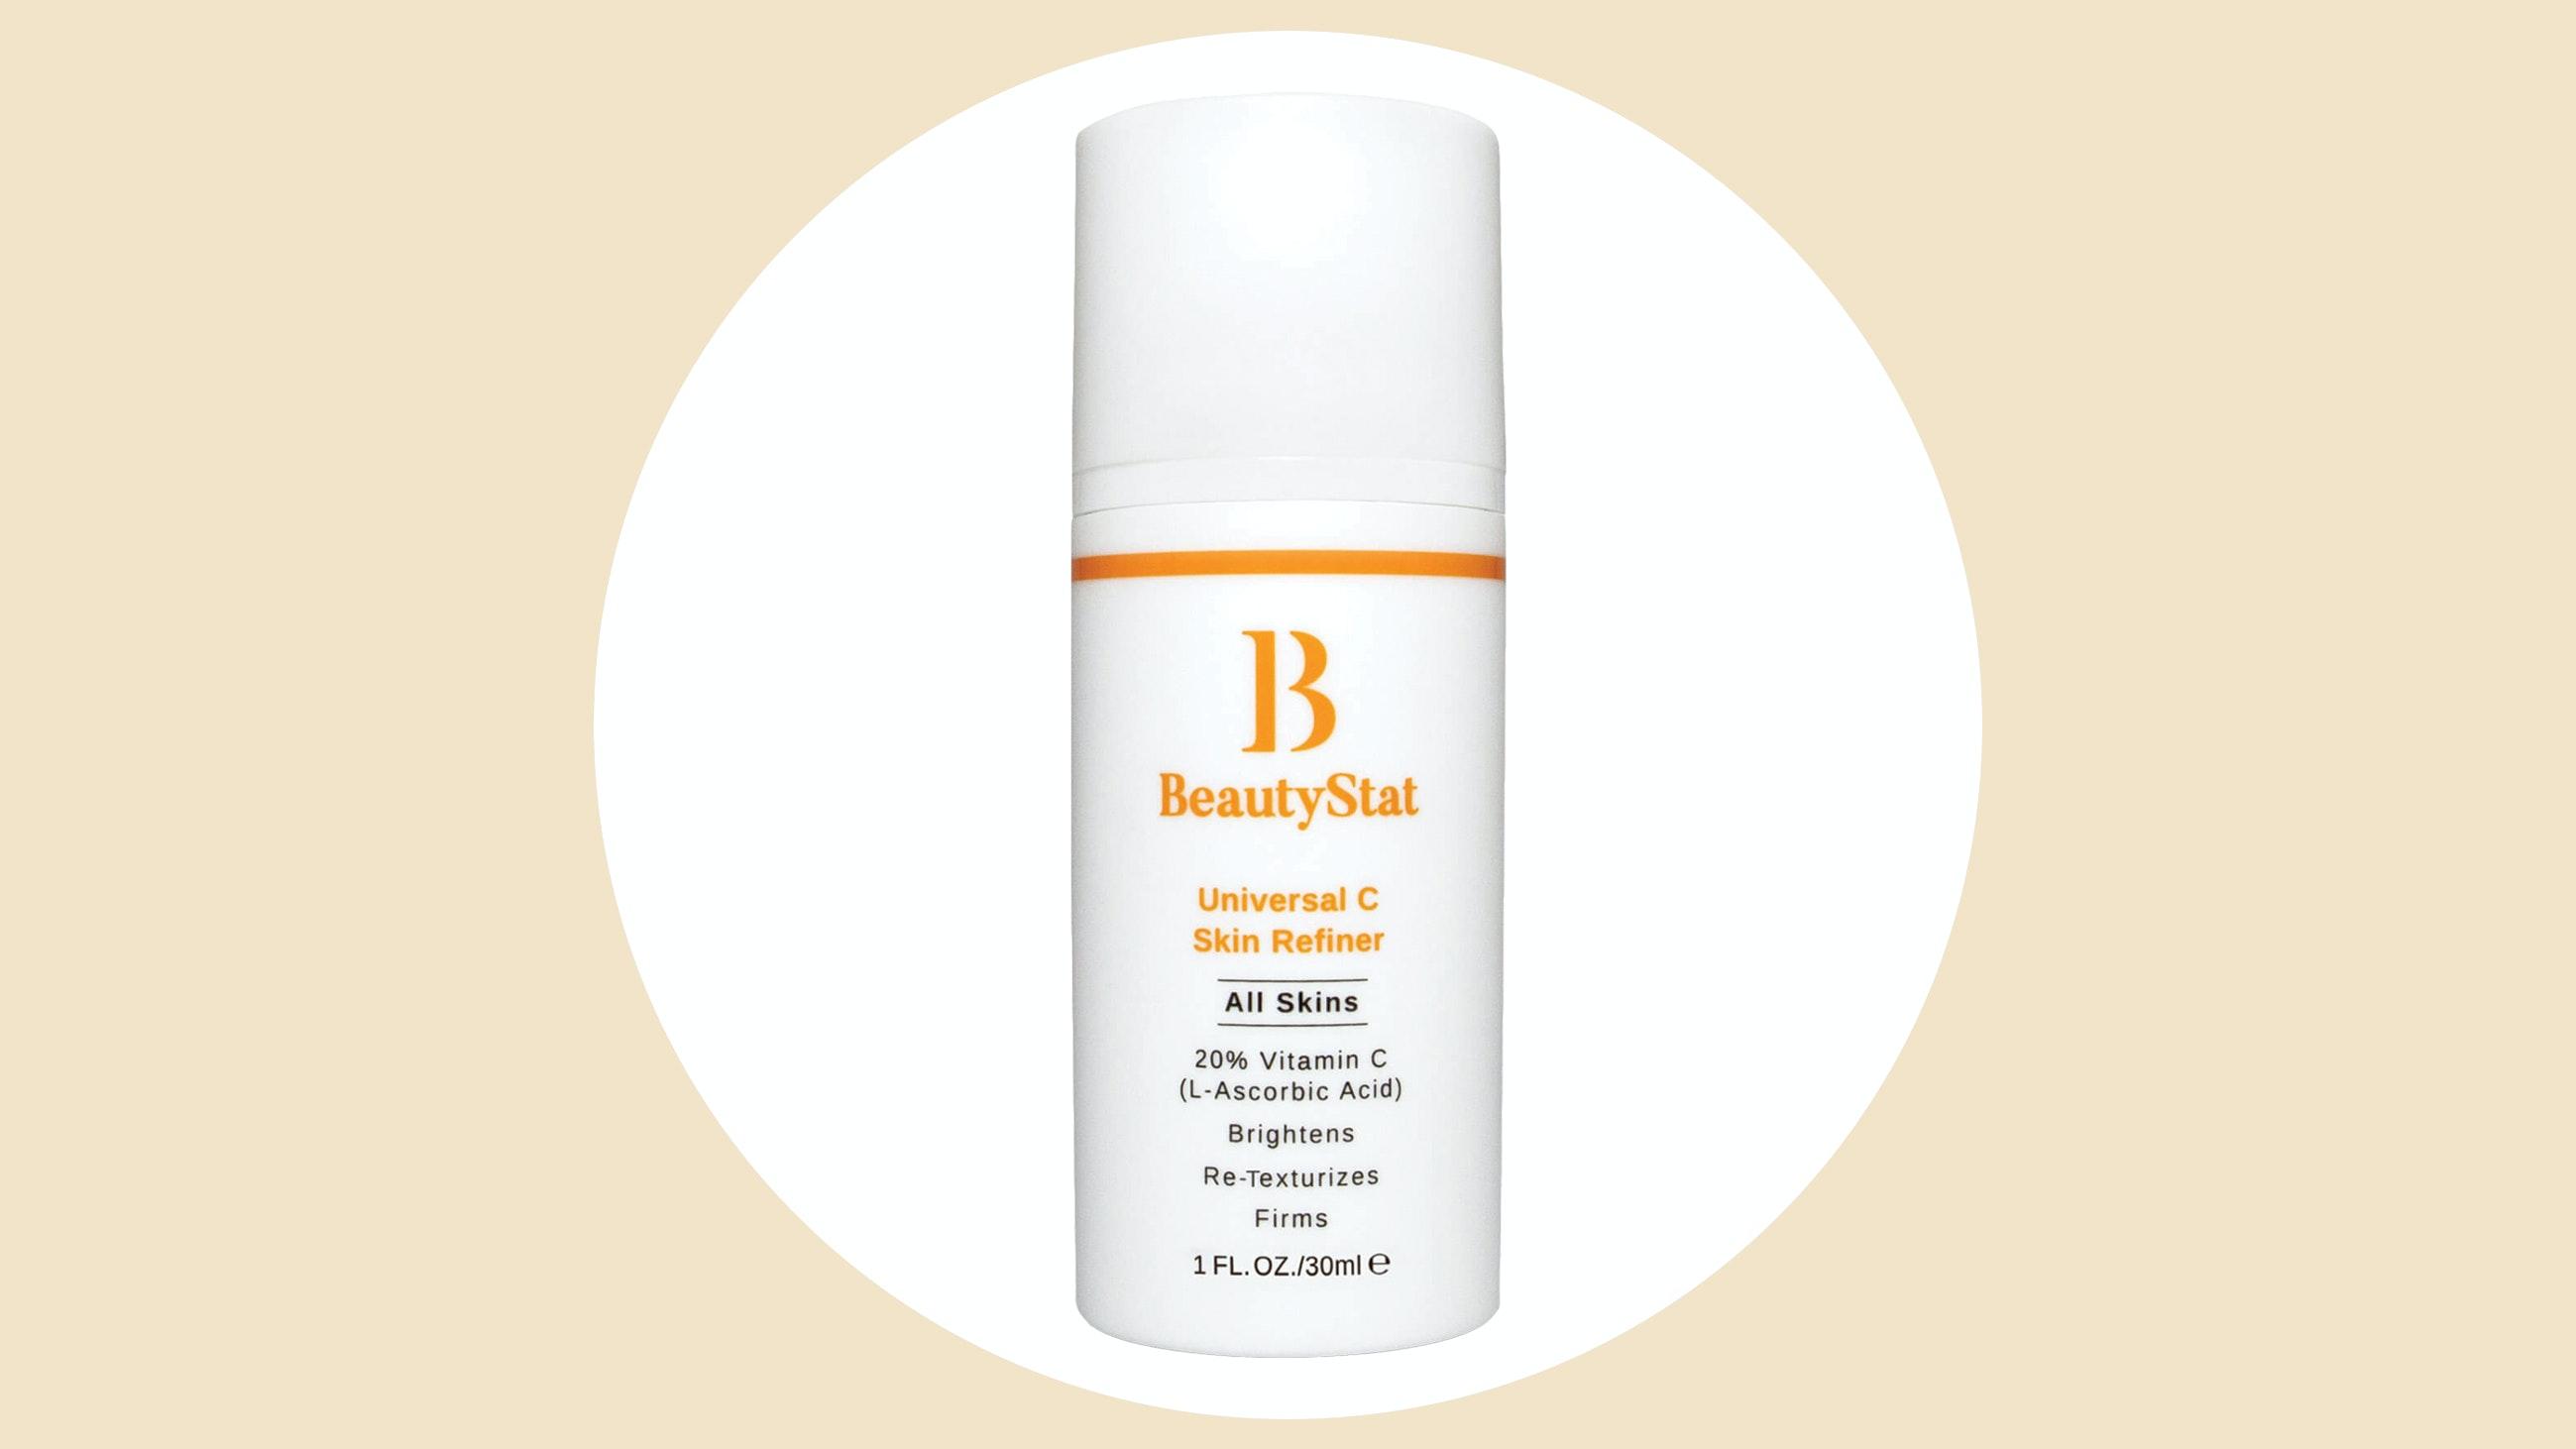 beautystat vitamin c universal c skin refiner review